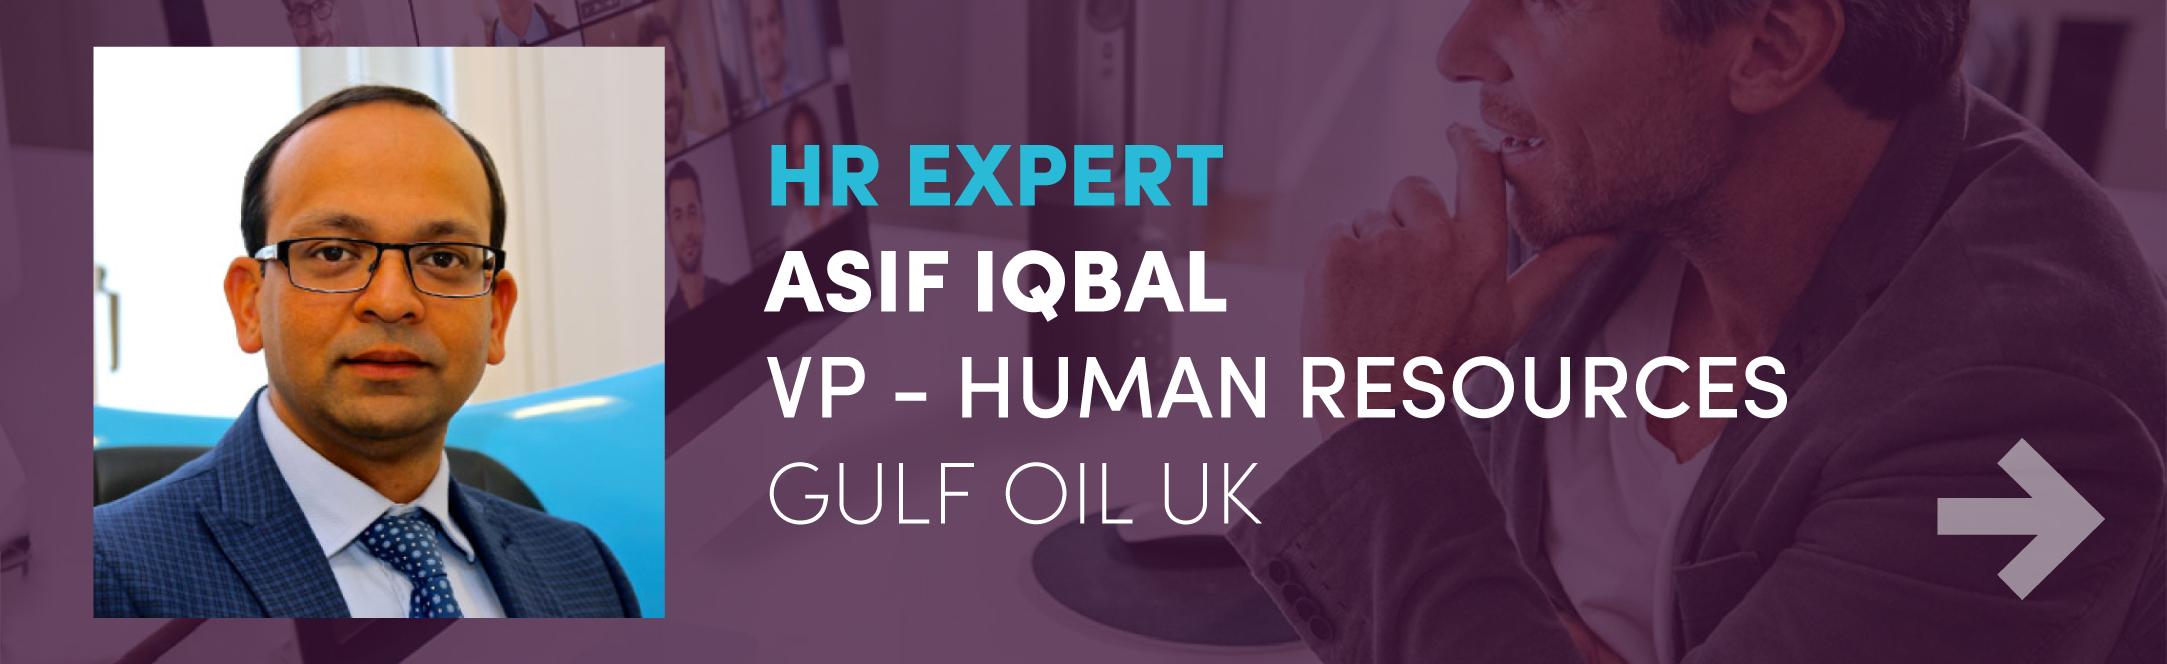 Asif Iqbal hr expert human resources